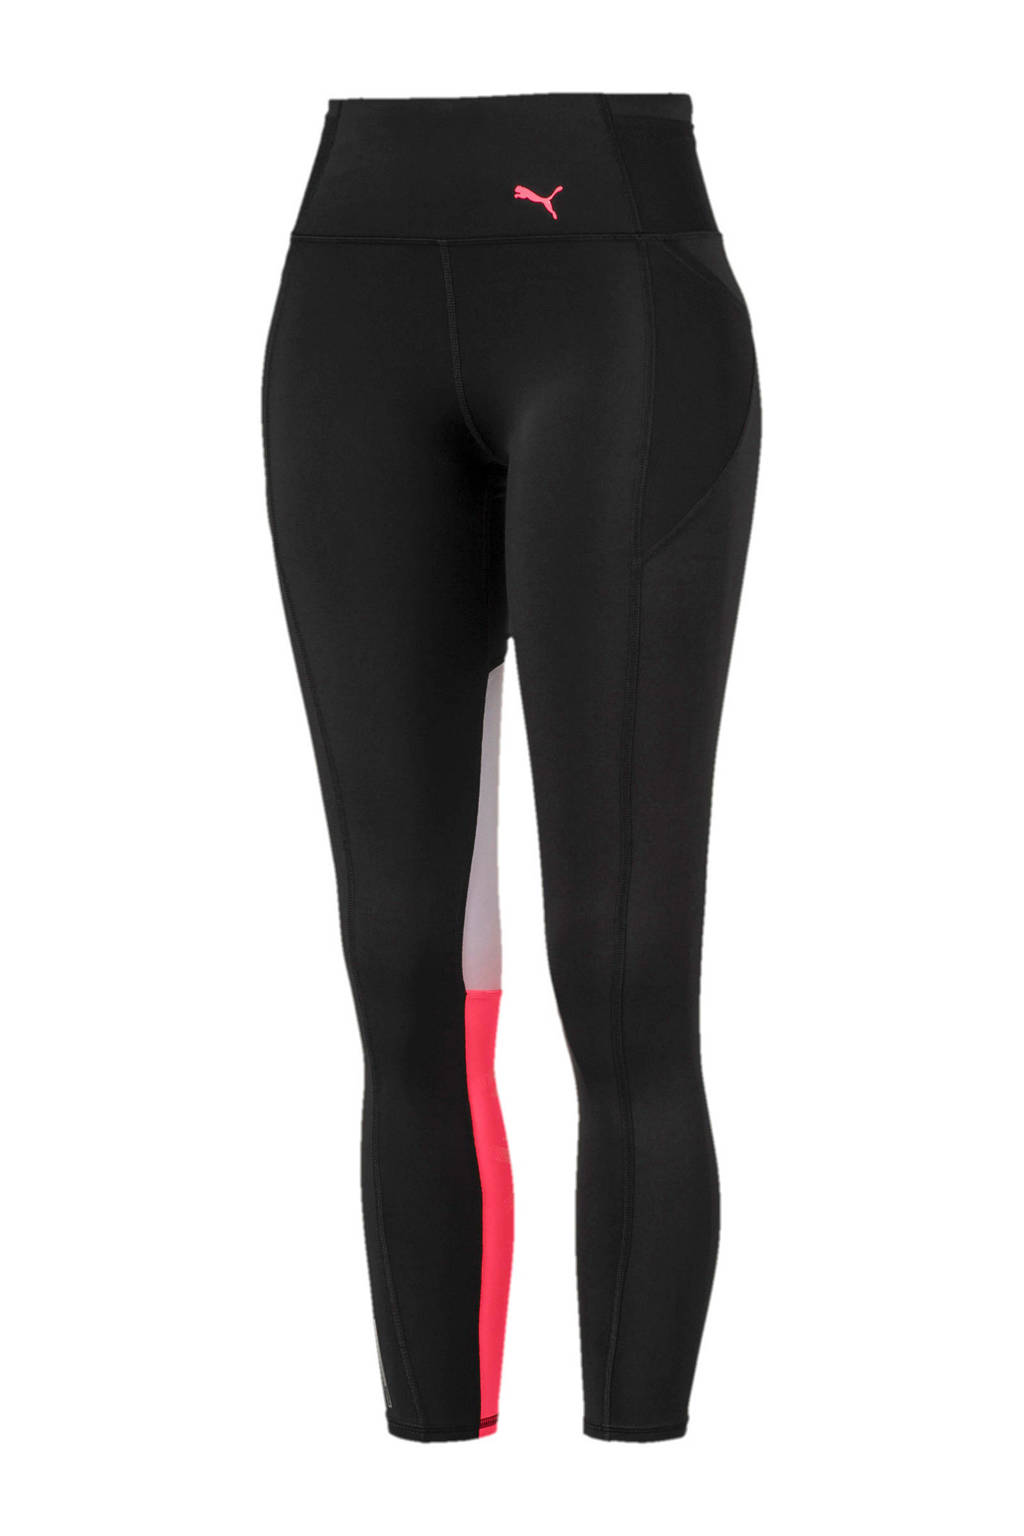 Puma sportbroek zwart/roze/wit, Zwart/roze/wit